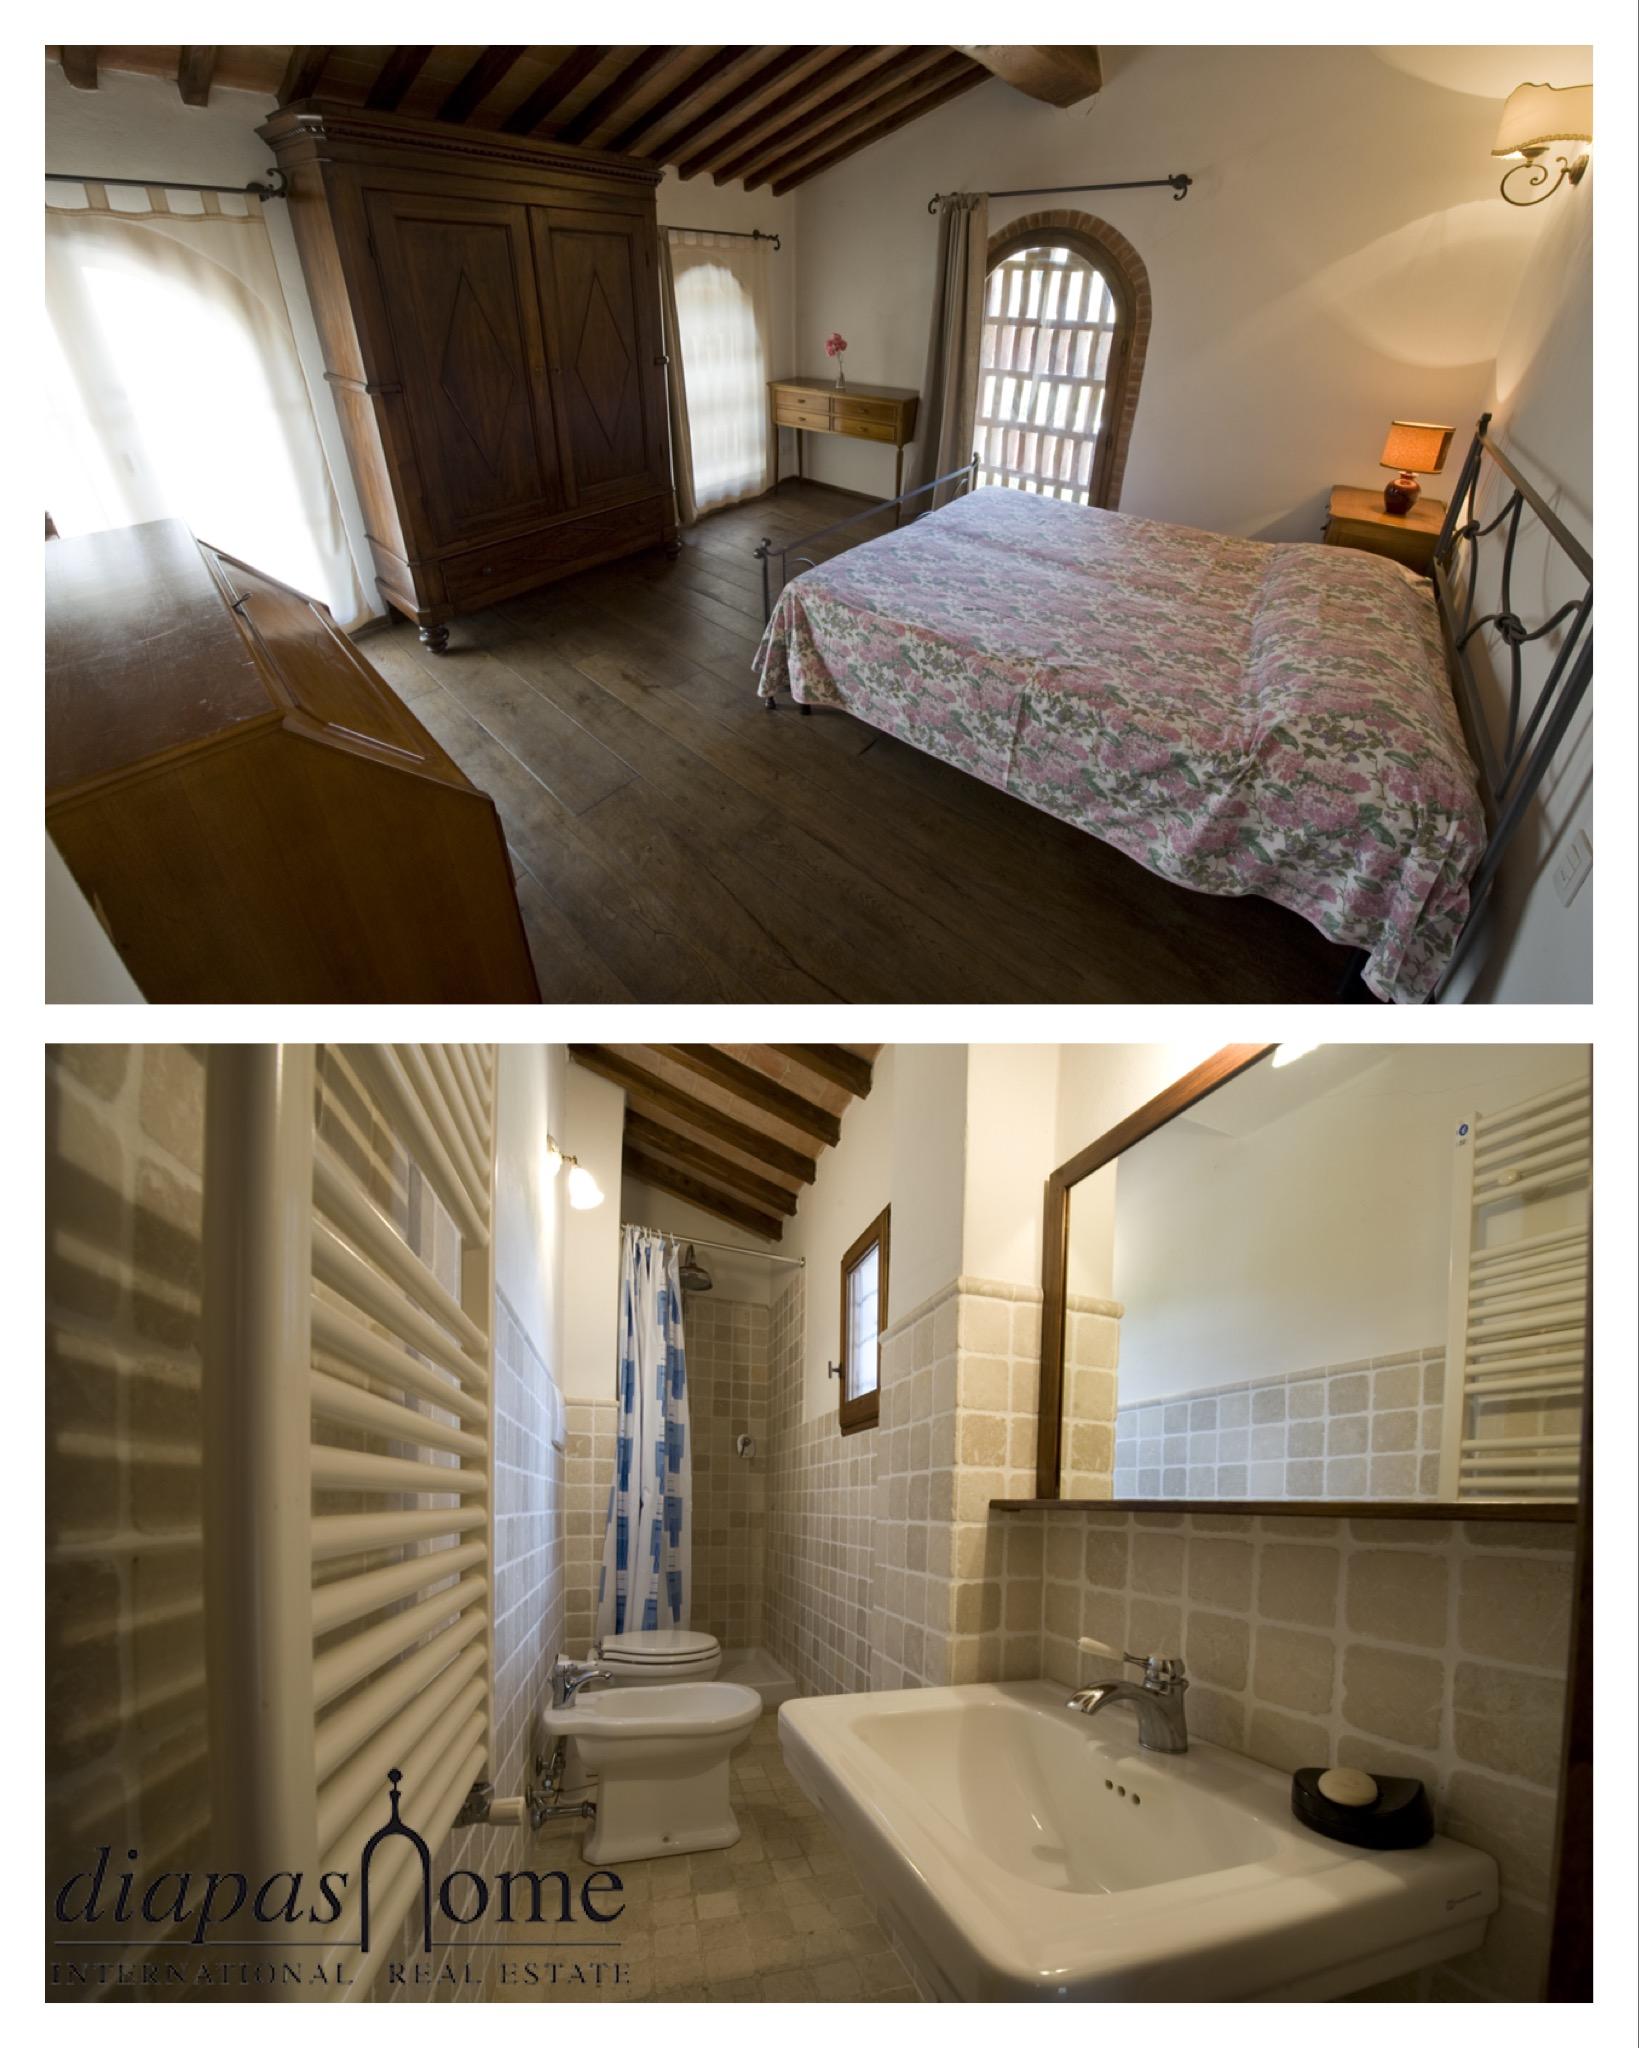 villa, carmignano,diapashome,real,estate_17